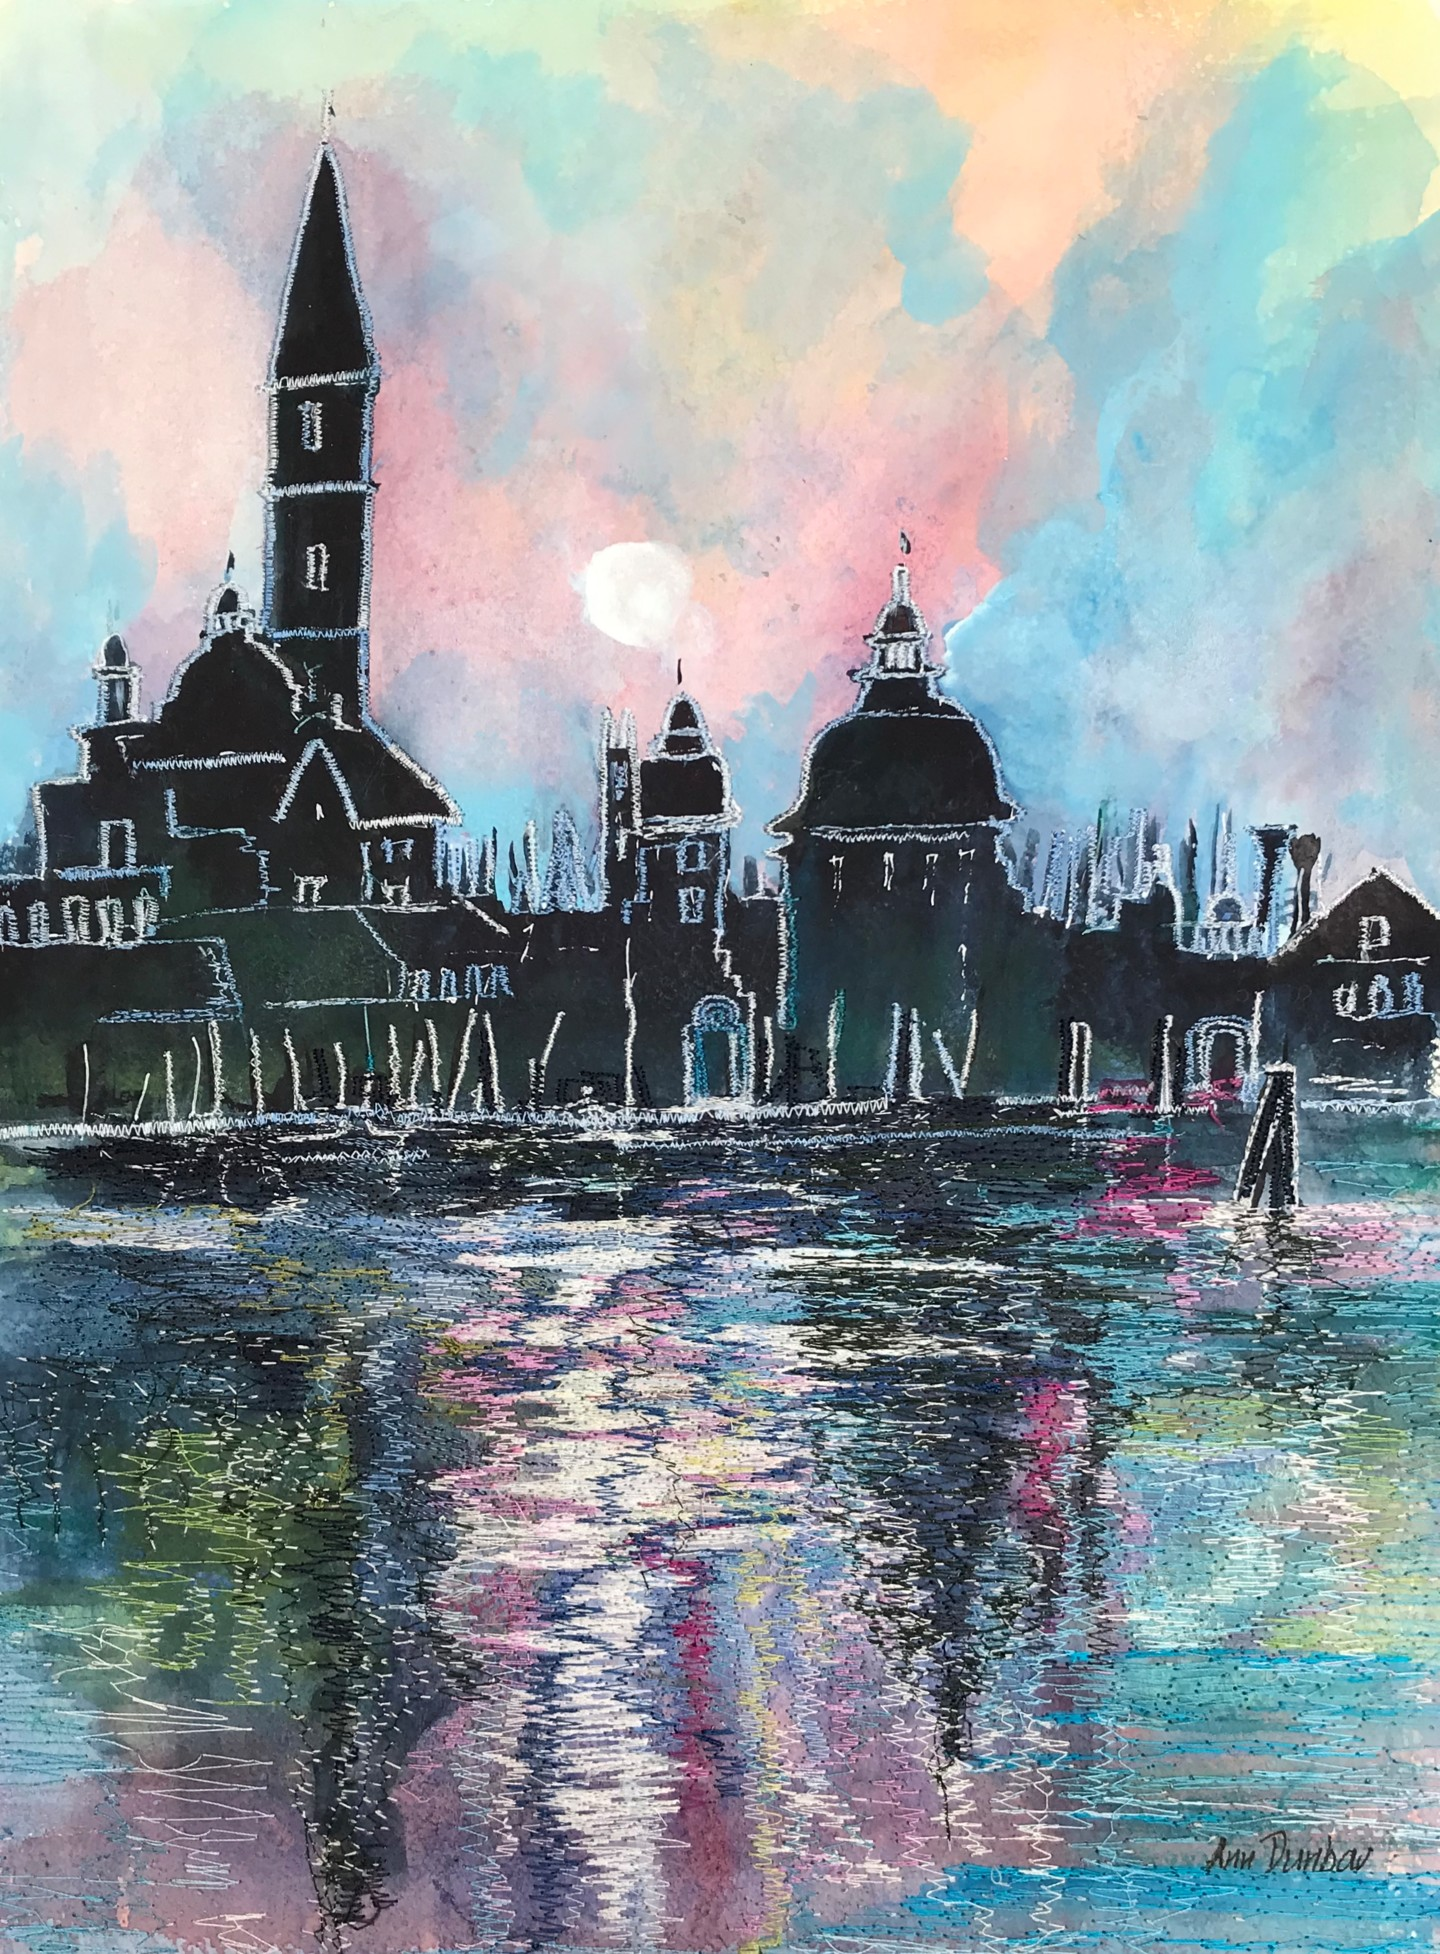 Ann Dunbar - Moonlight 2 at St Gorgio